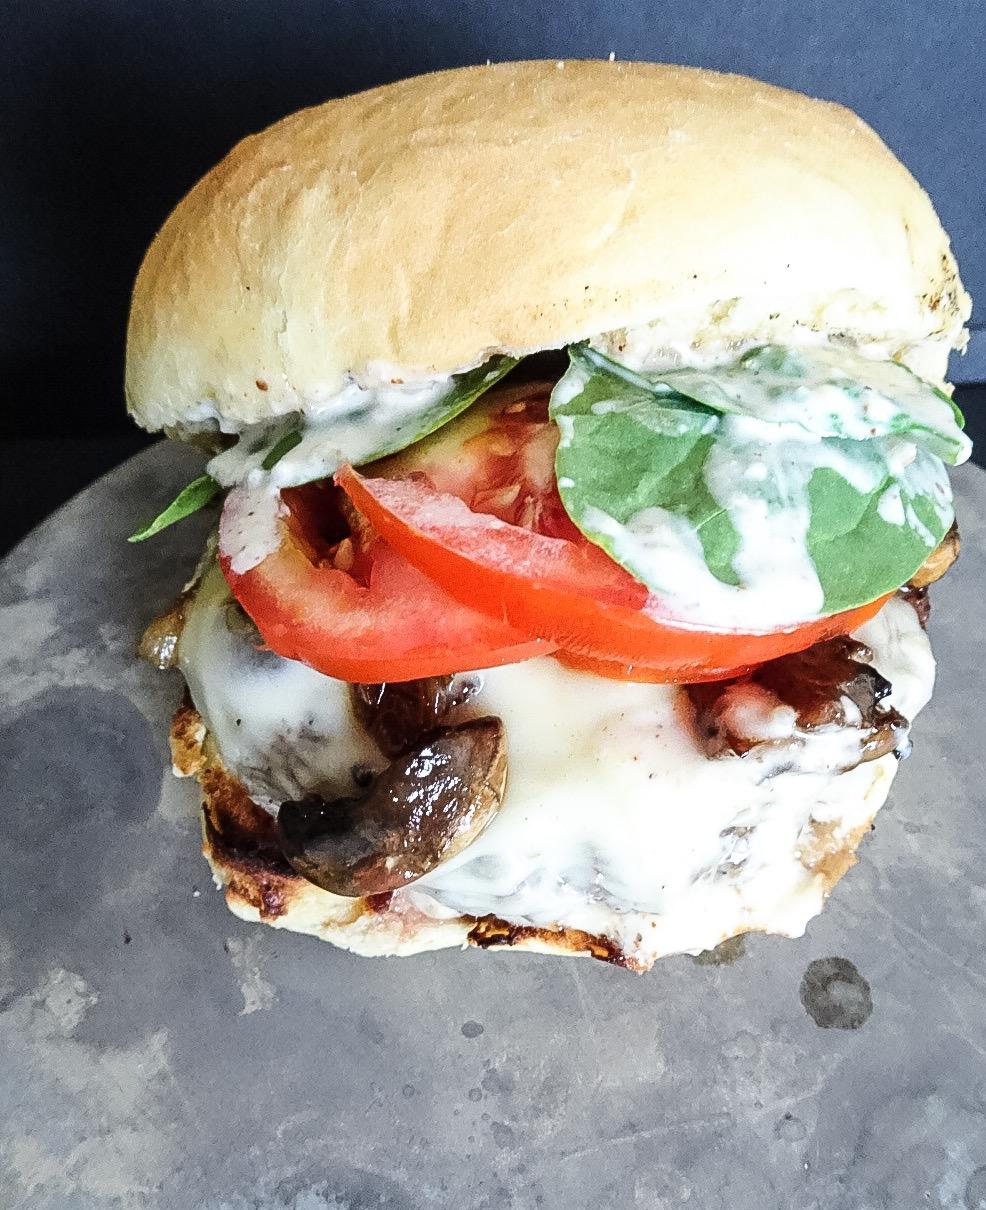 caramelized onion and mushroom burger